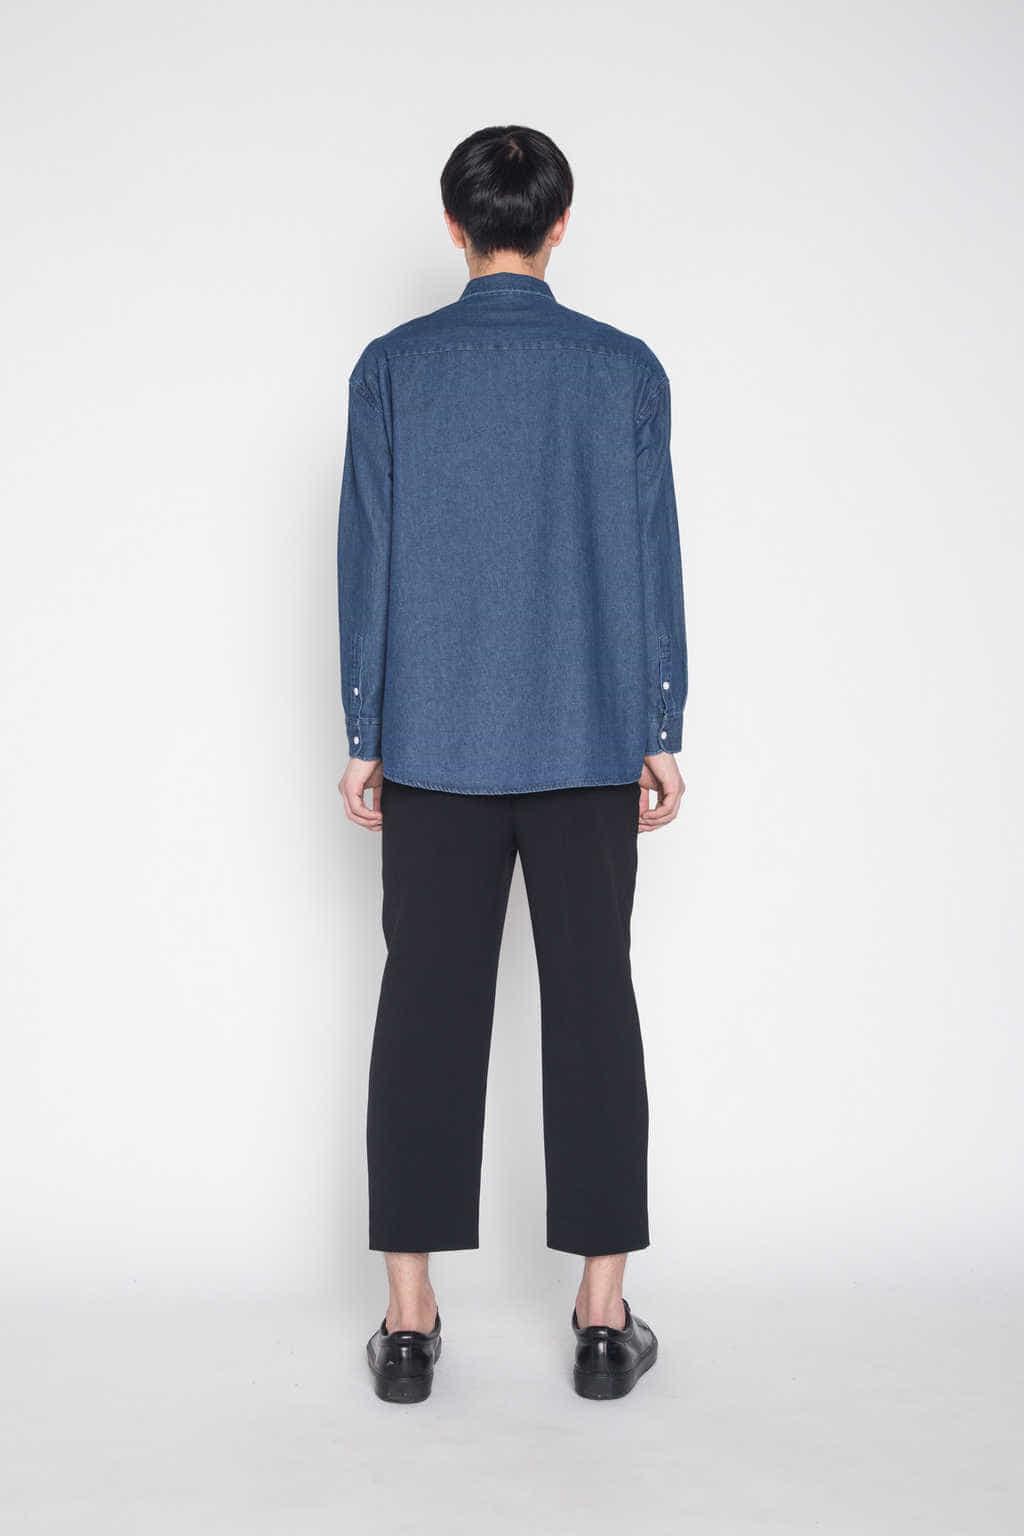 Shirt G006 Indigo 4